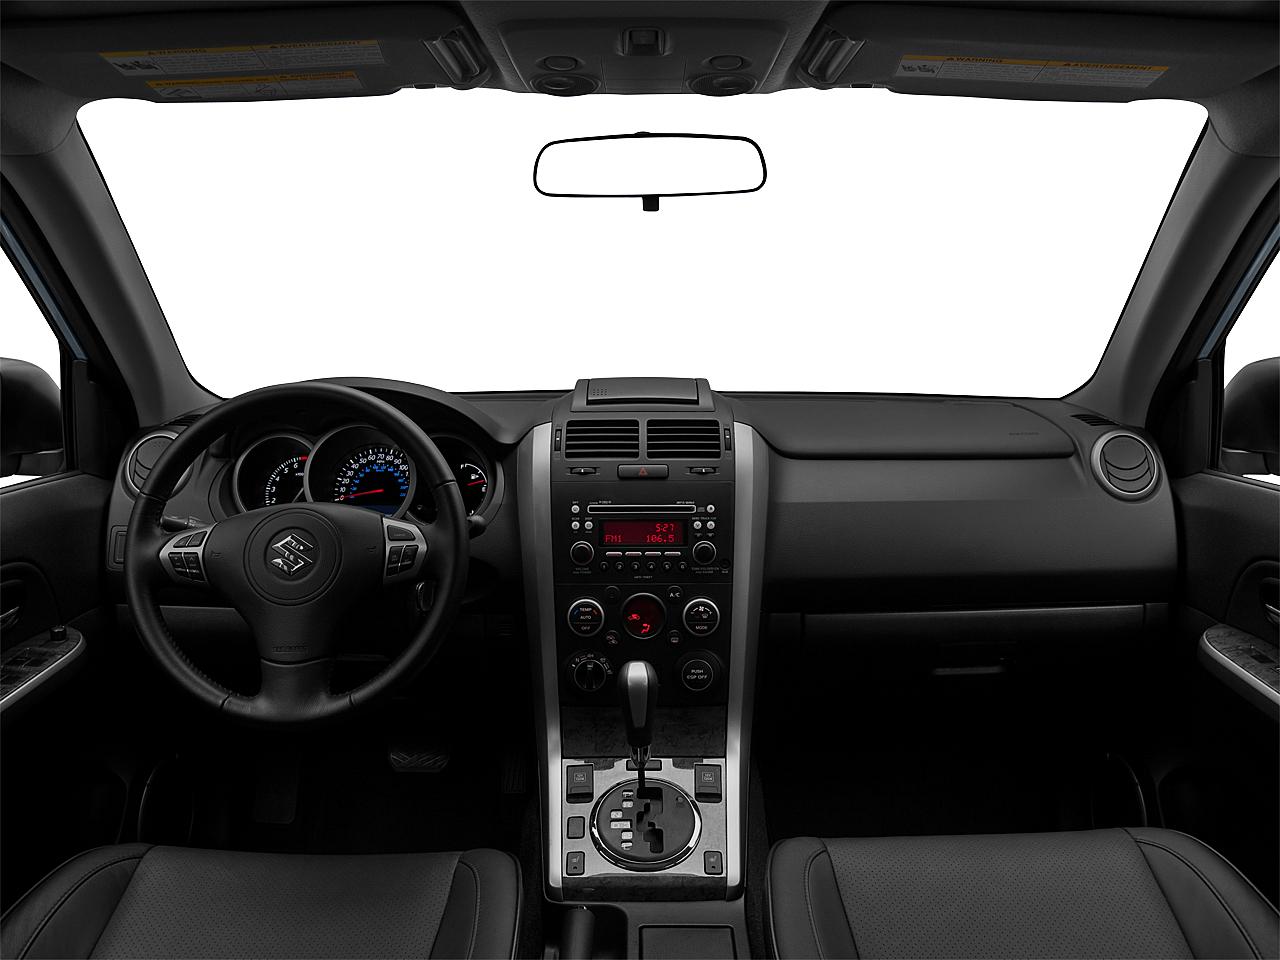 2011 Suzuki Grand Vitara Premium 4dr SUV - Research ...